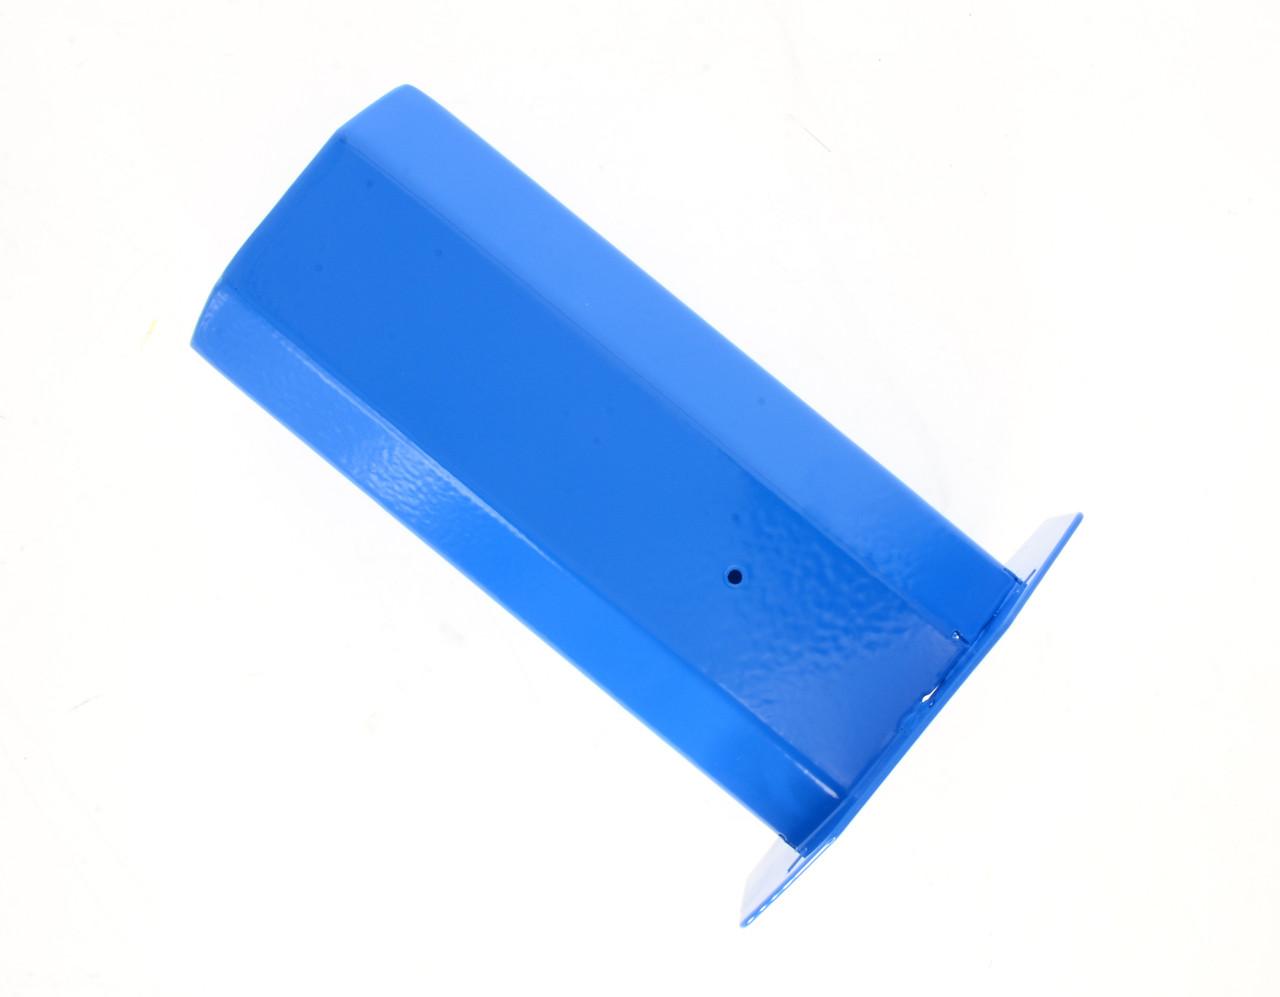 Piñata Bat Holder (PNT-SA-10-R0)